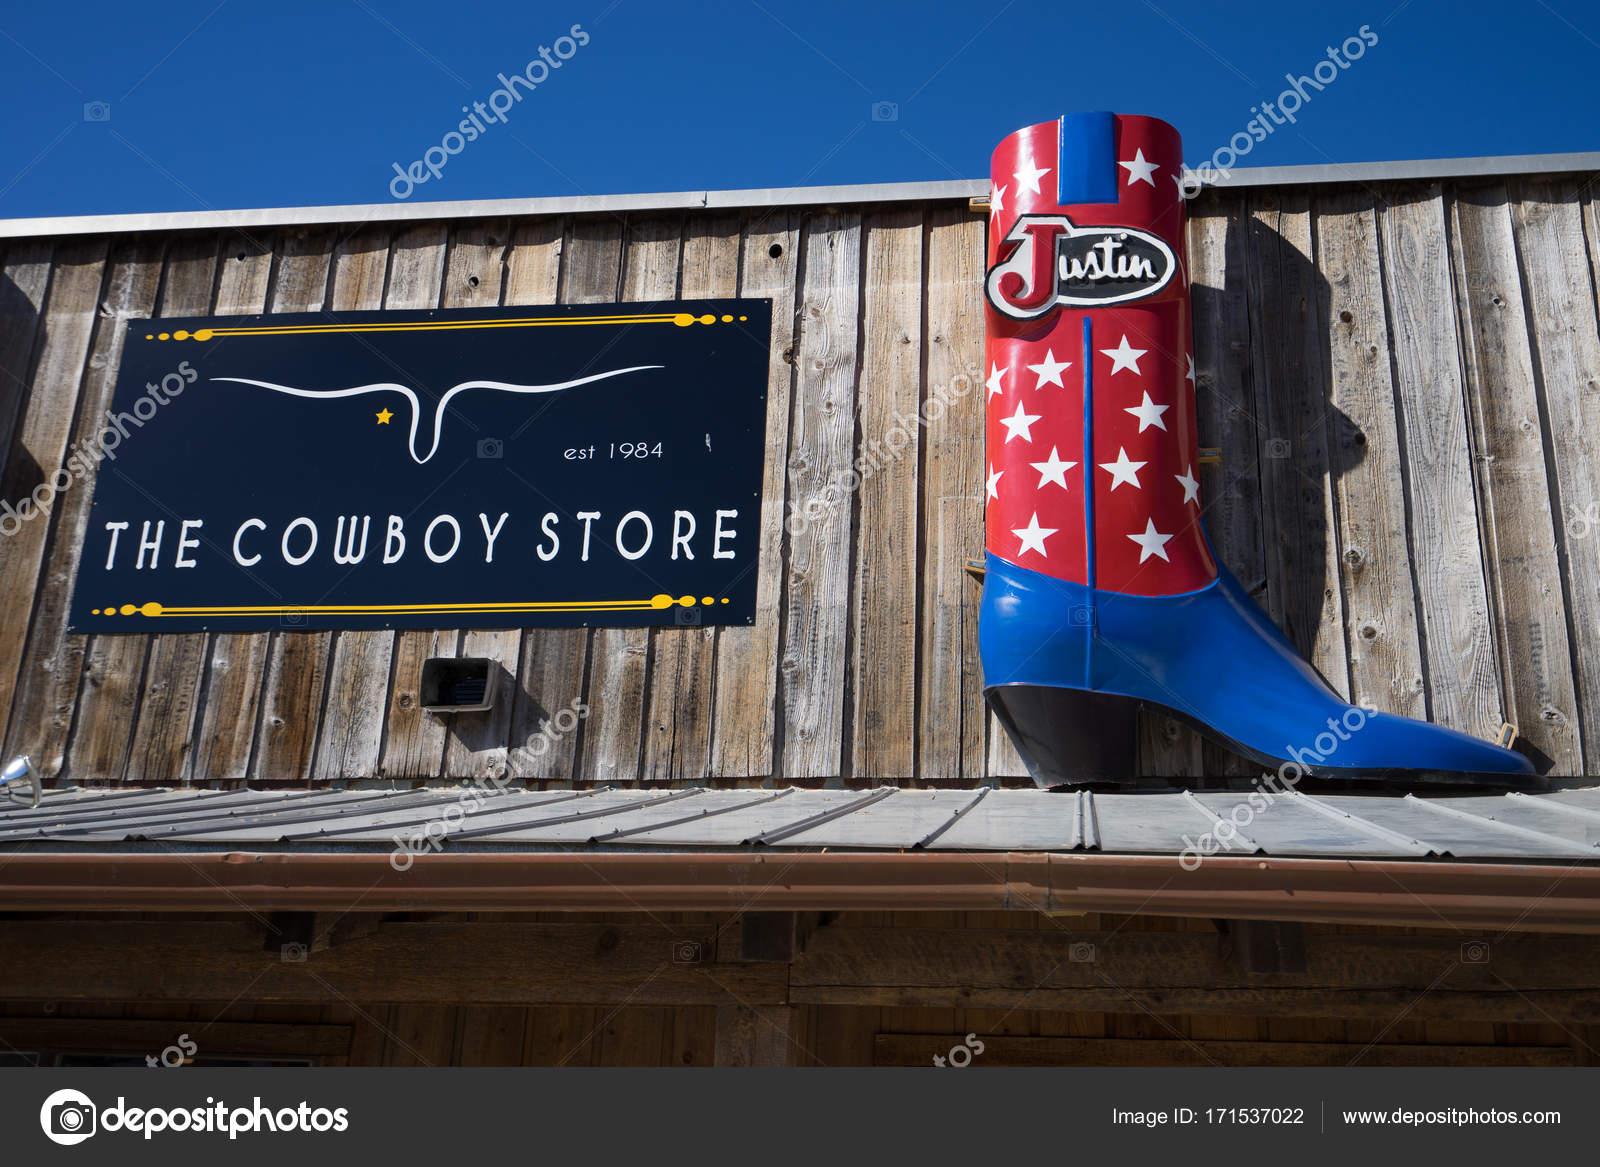 Texas Shop, Western Shop, Cowboy Shop für Kids